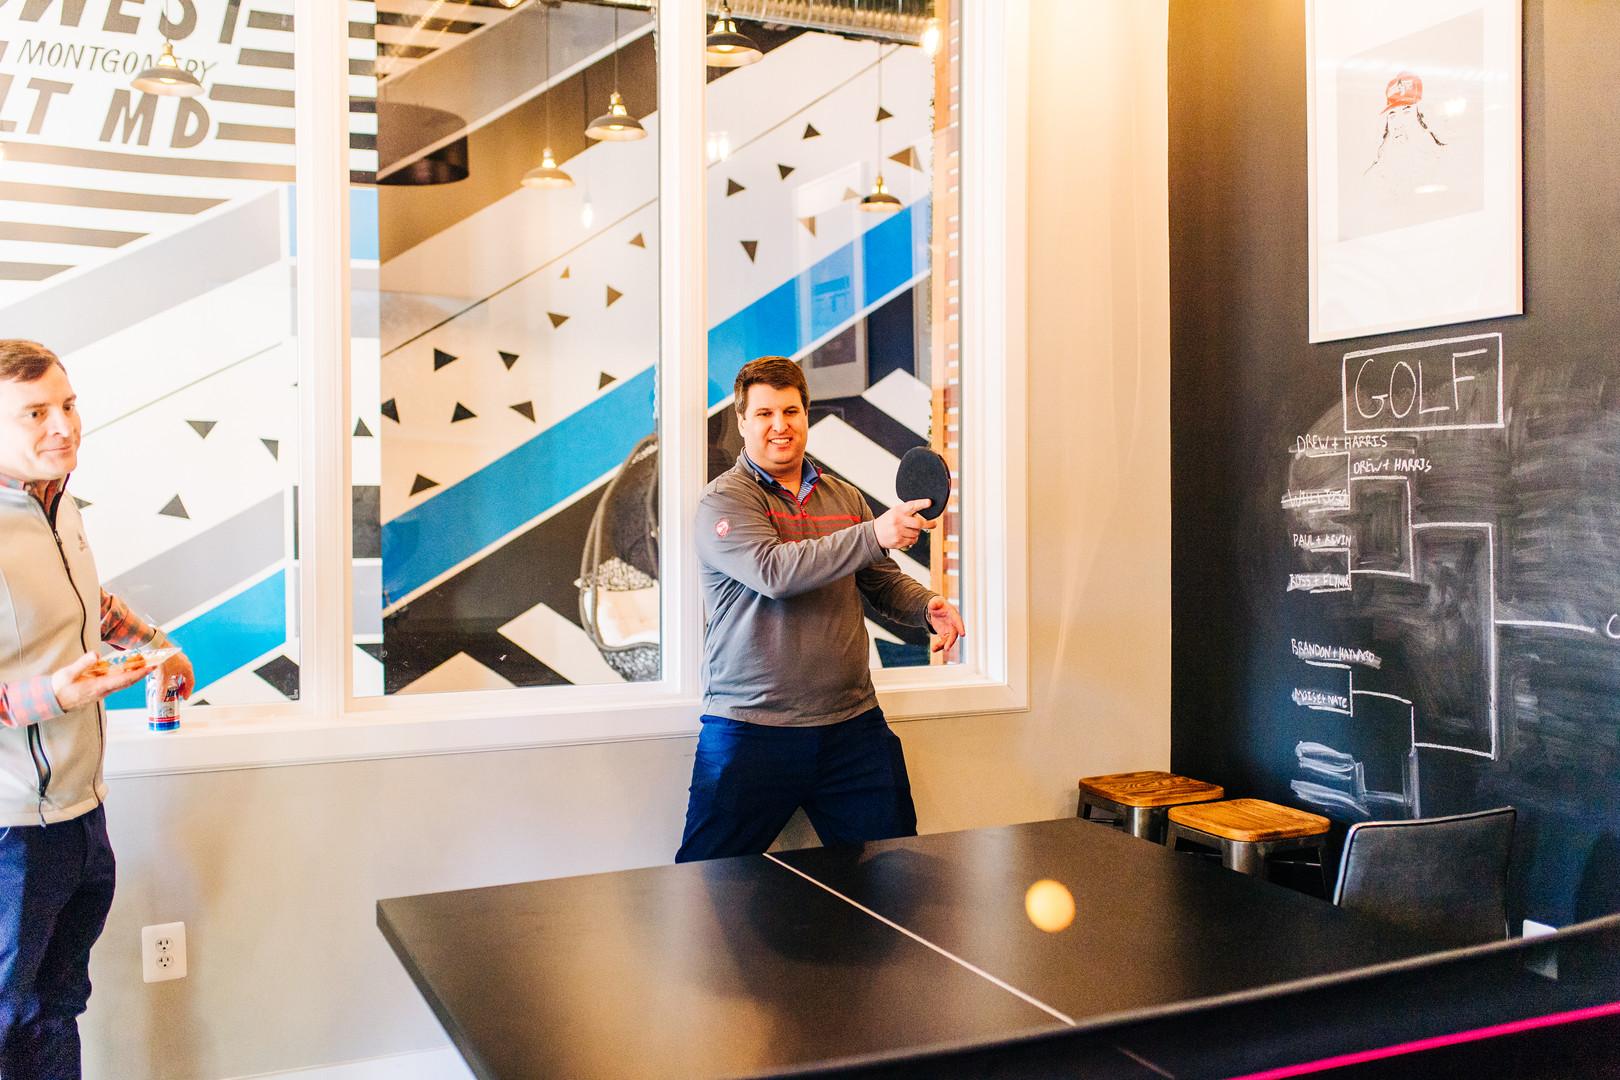 Golf and Pong Tournament 1.jpg